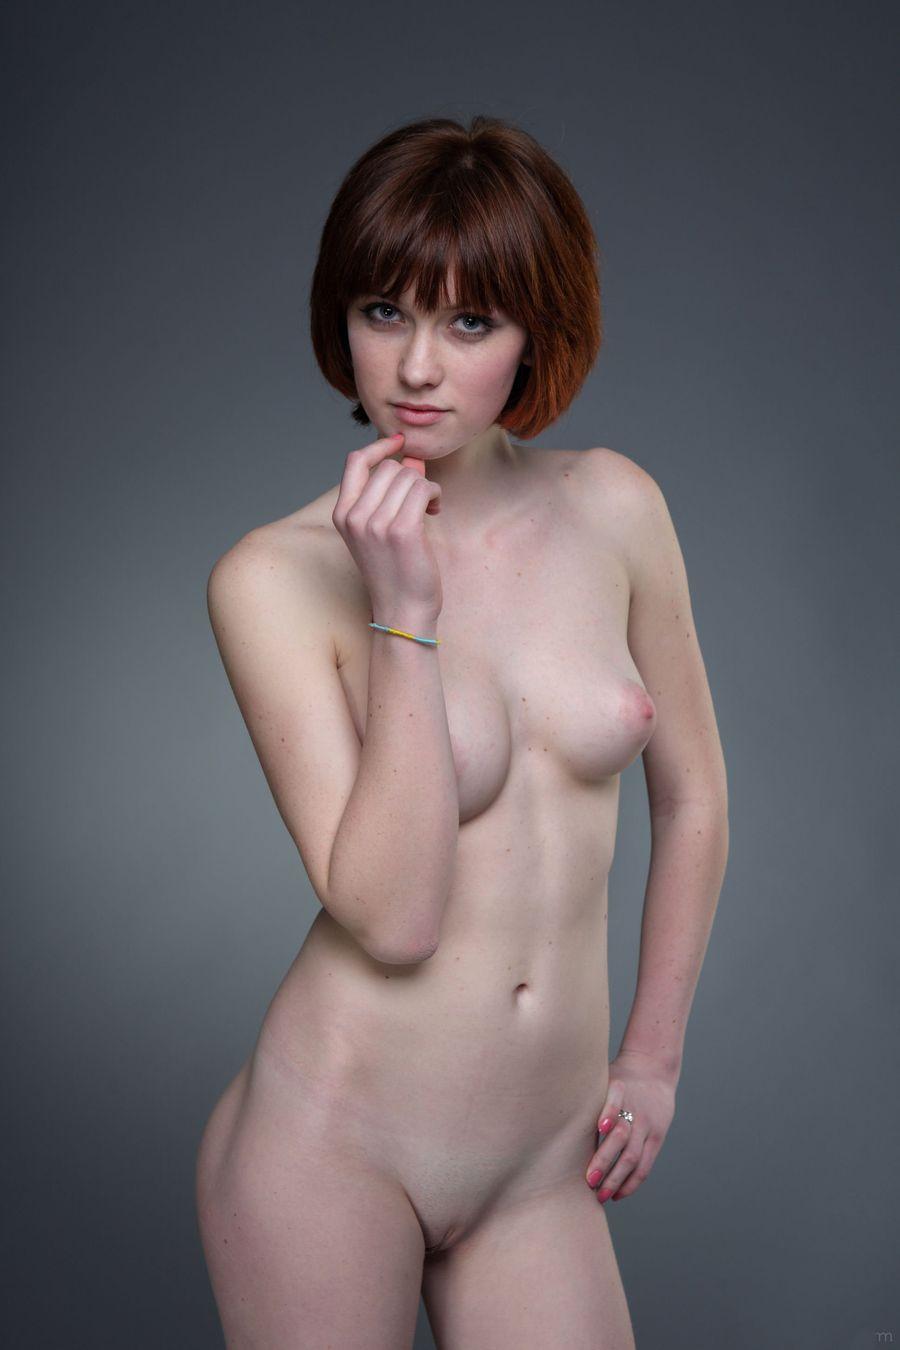 nude-short-red-hair-woman-kolly-wood-actress-naked-sex